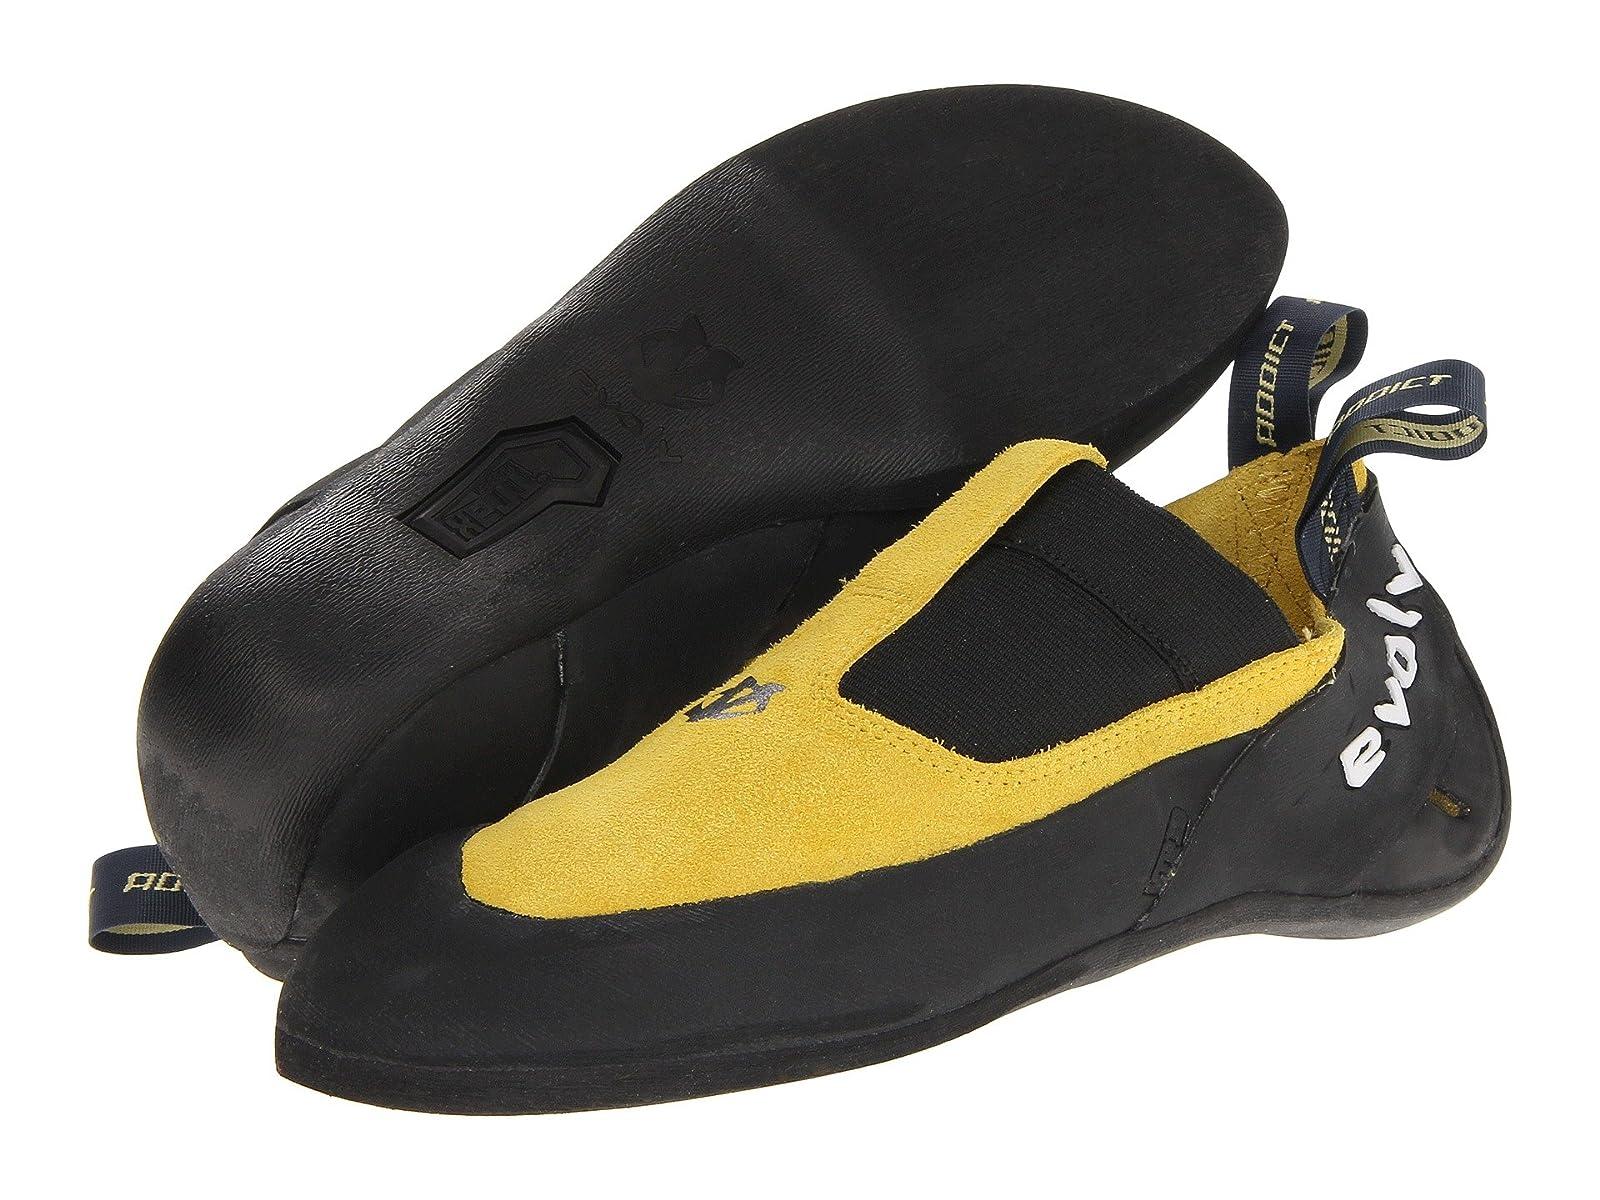 EVOLV AddictAtmospheric grades have affordable shoes